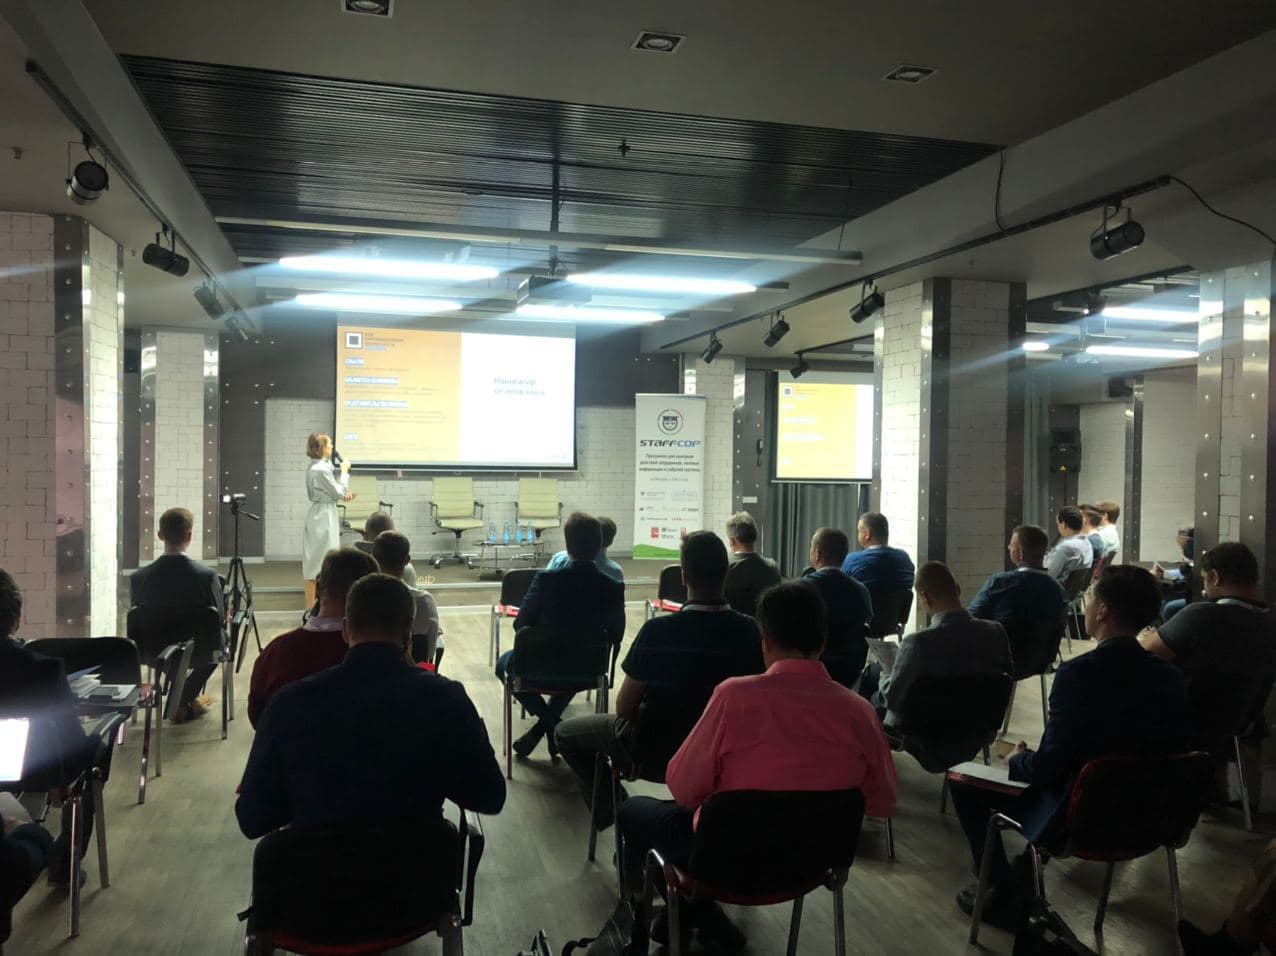 Конференция Код ИБ добралась до Нижнего Новгорода